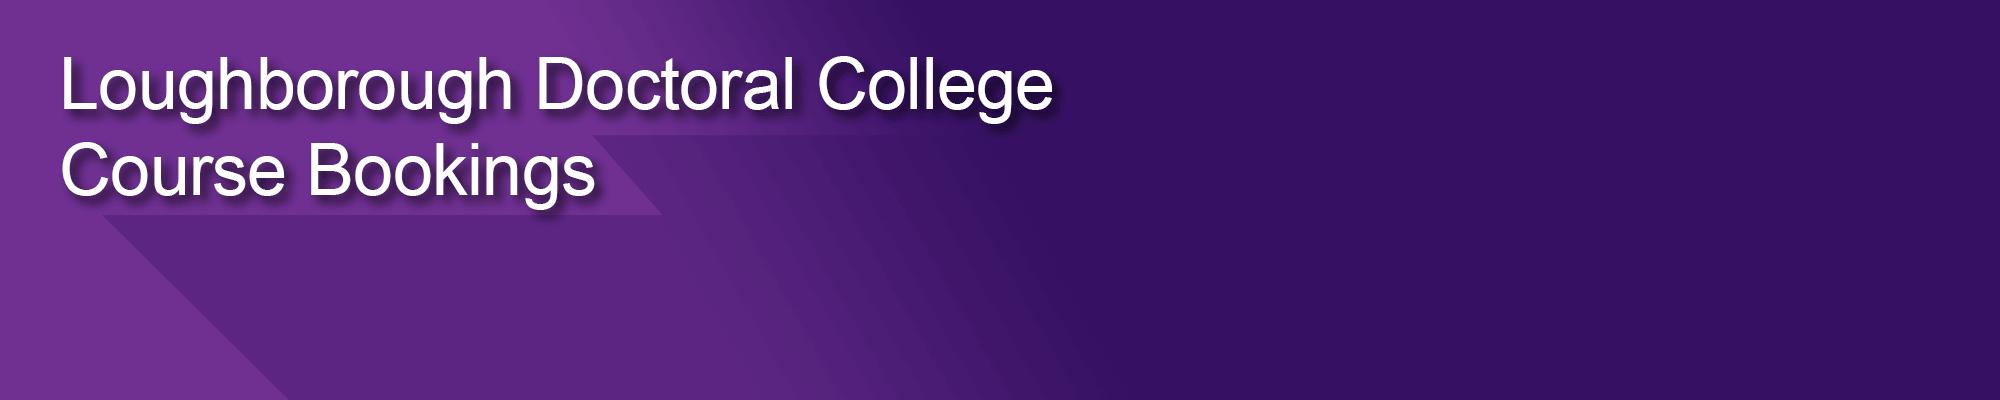 Graduate School Course Booking header